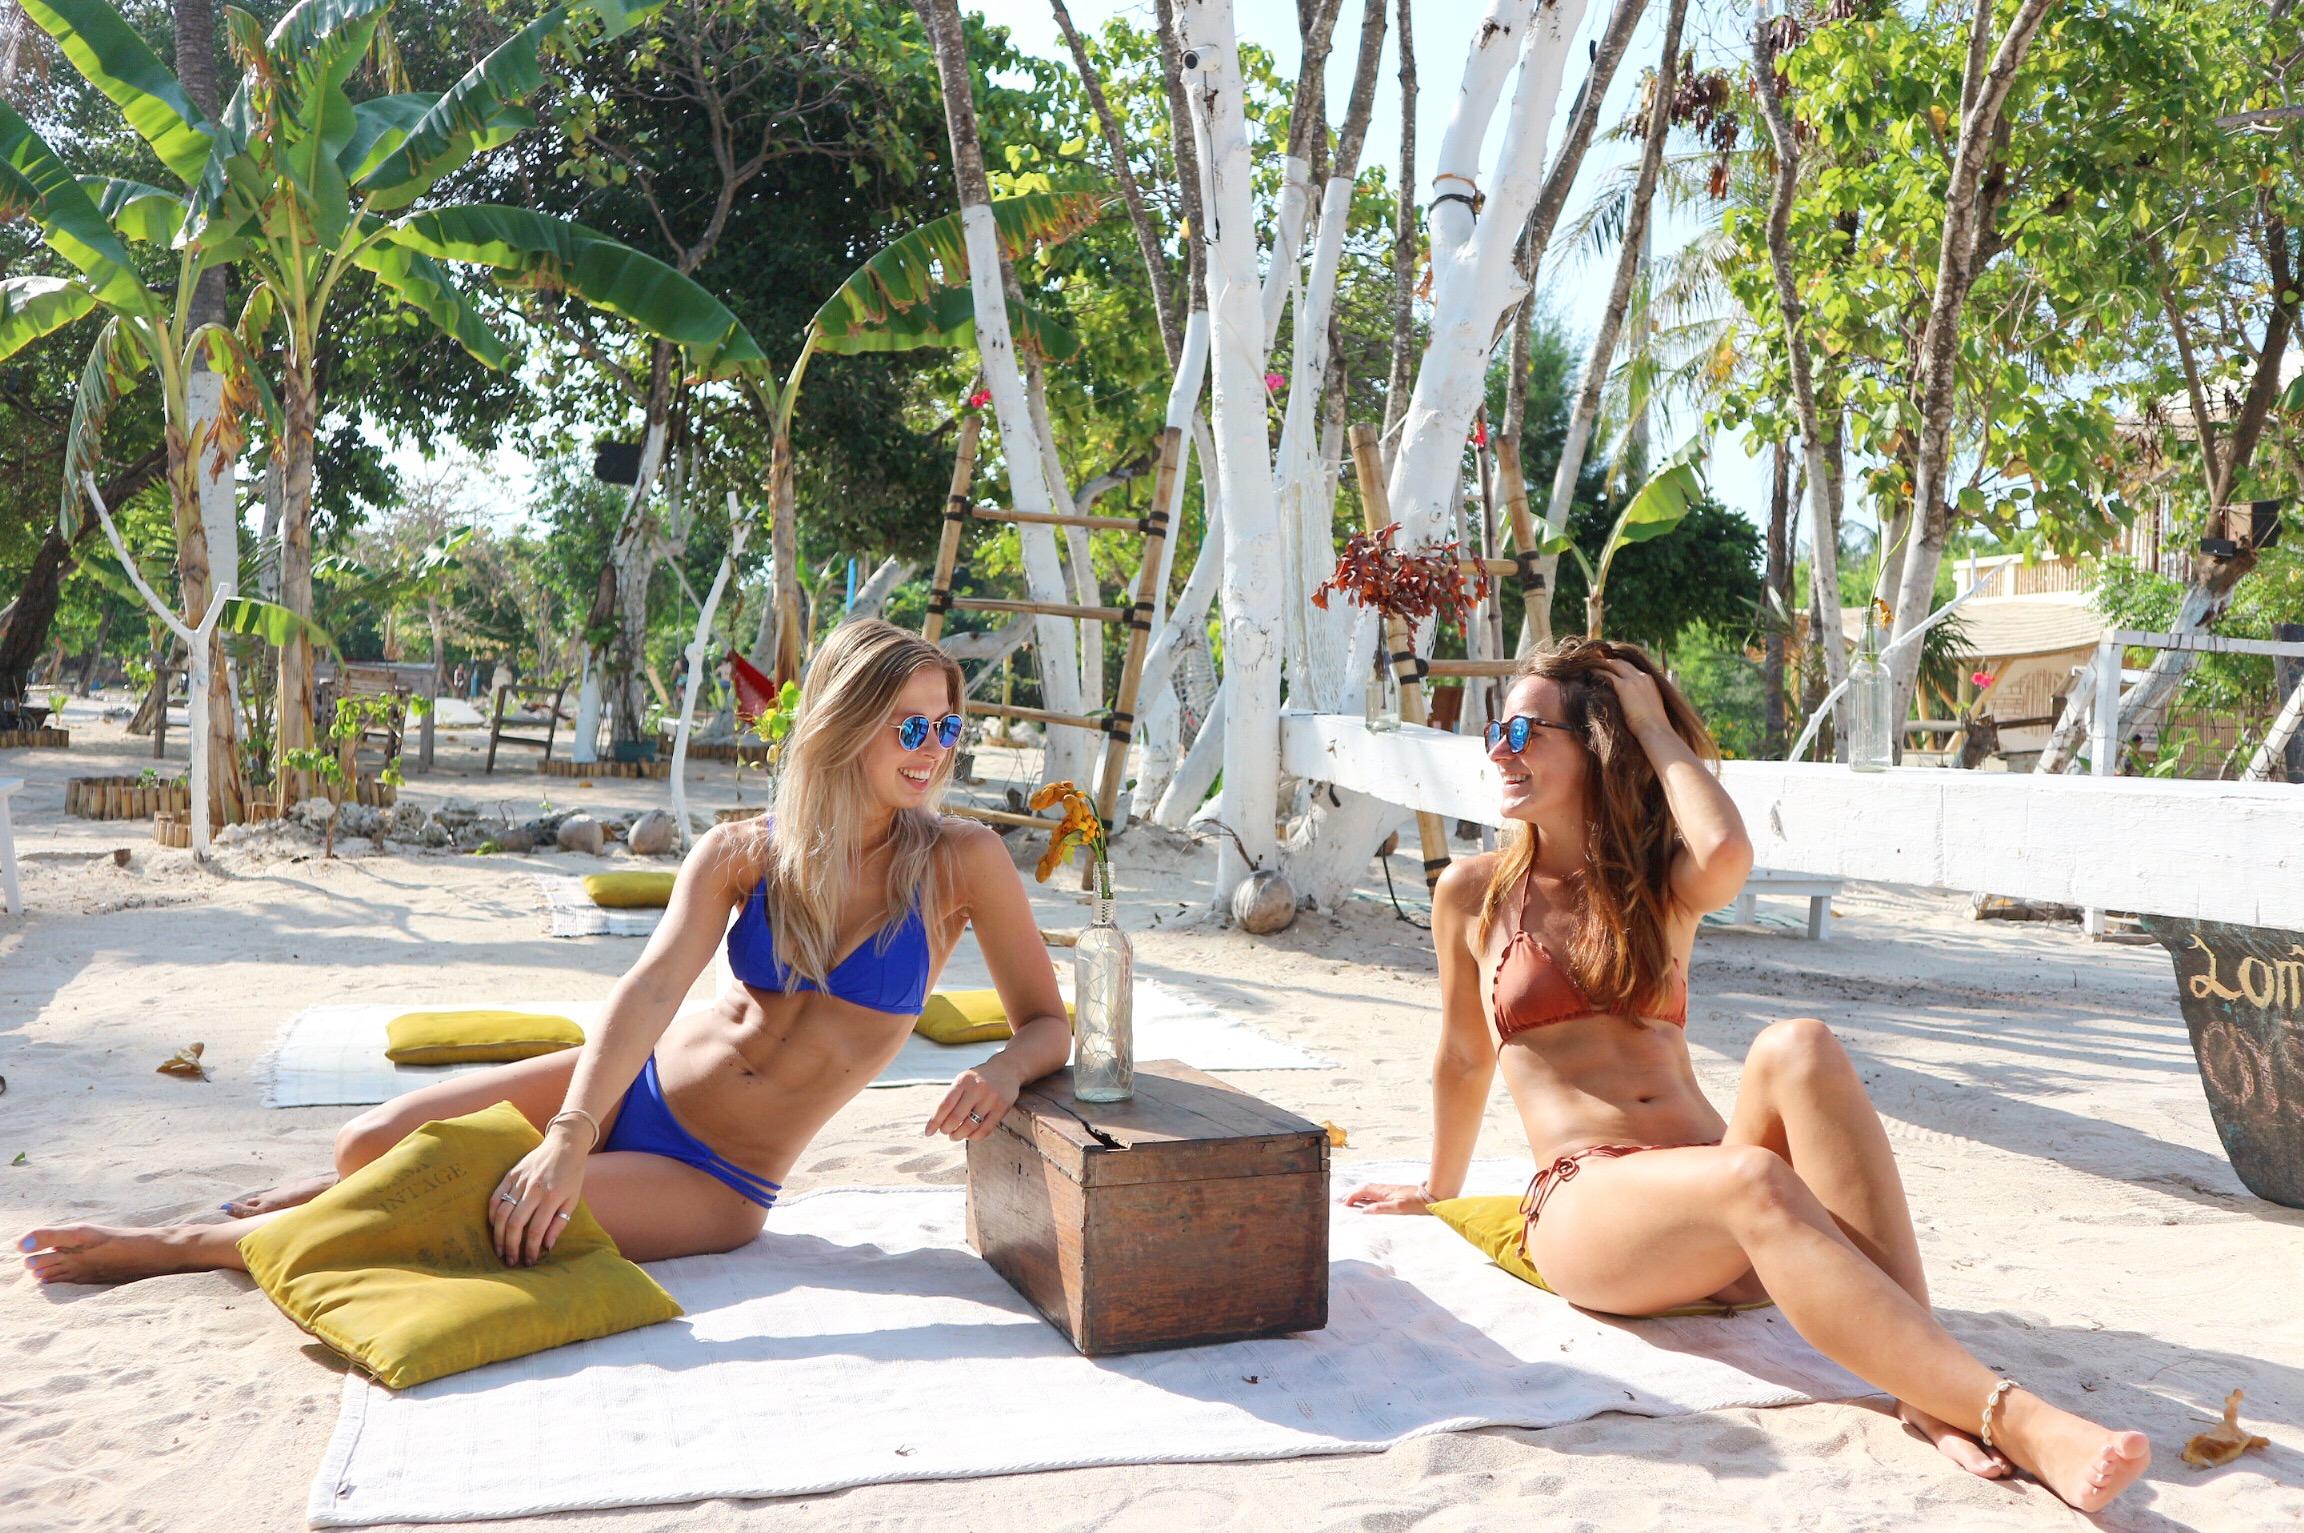 Gili, Gili trawangan, Bali, balivibes, vacay, vakantie, reizen, wereldreis, backpacken, zon, zee, strand